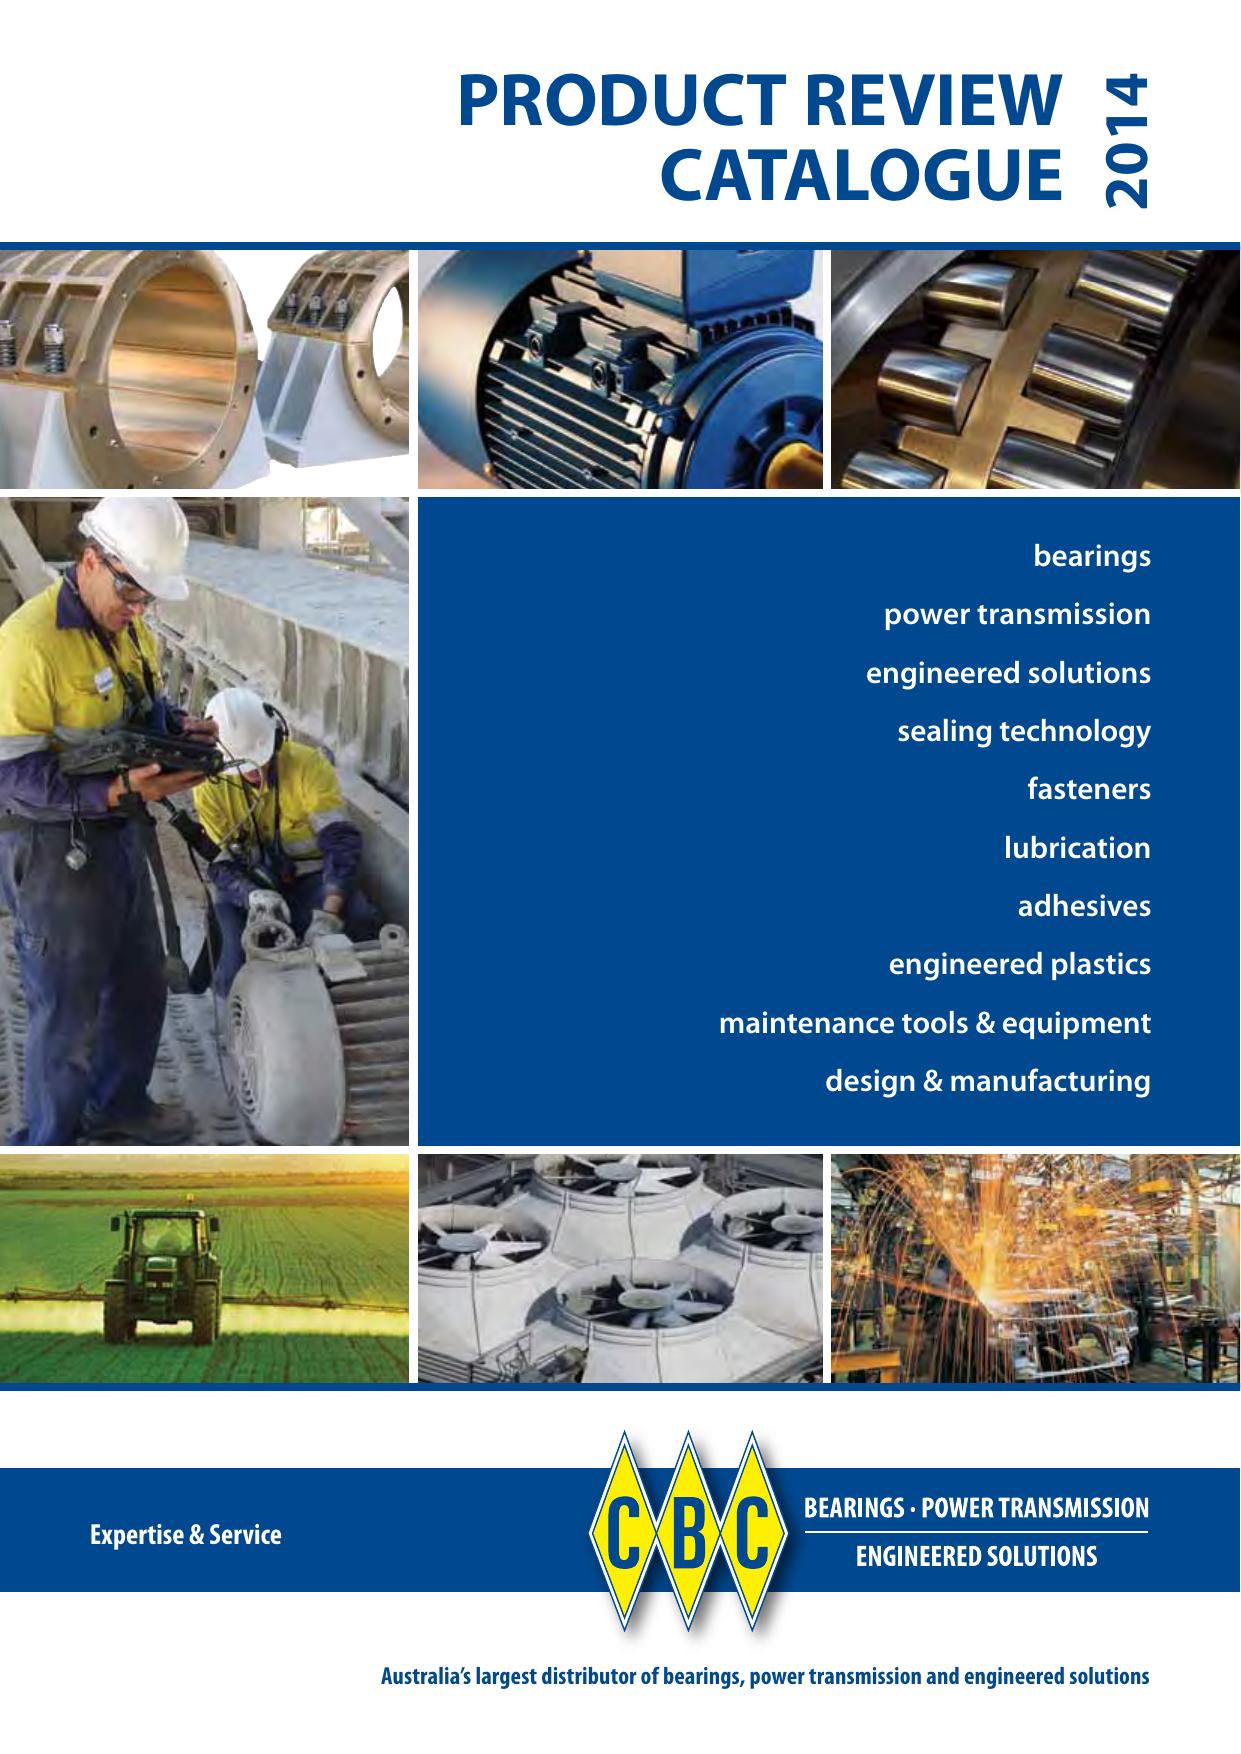 product review catalogue - CBC | manualzz com